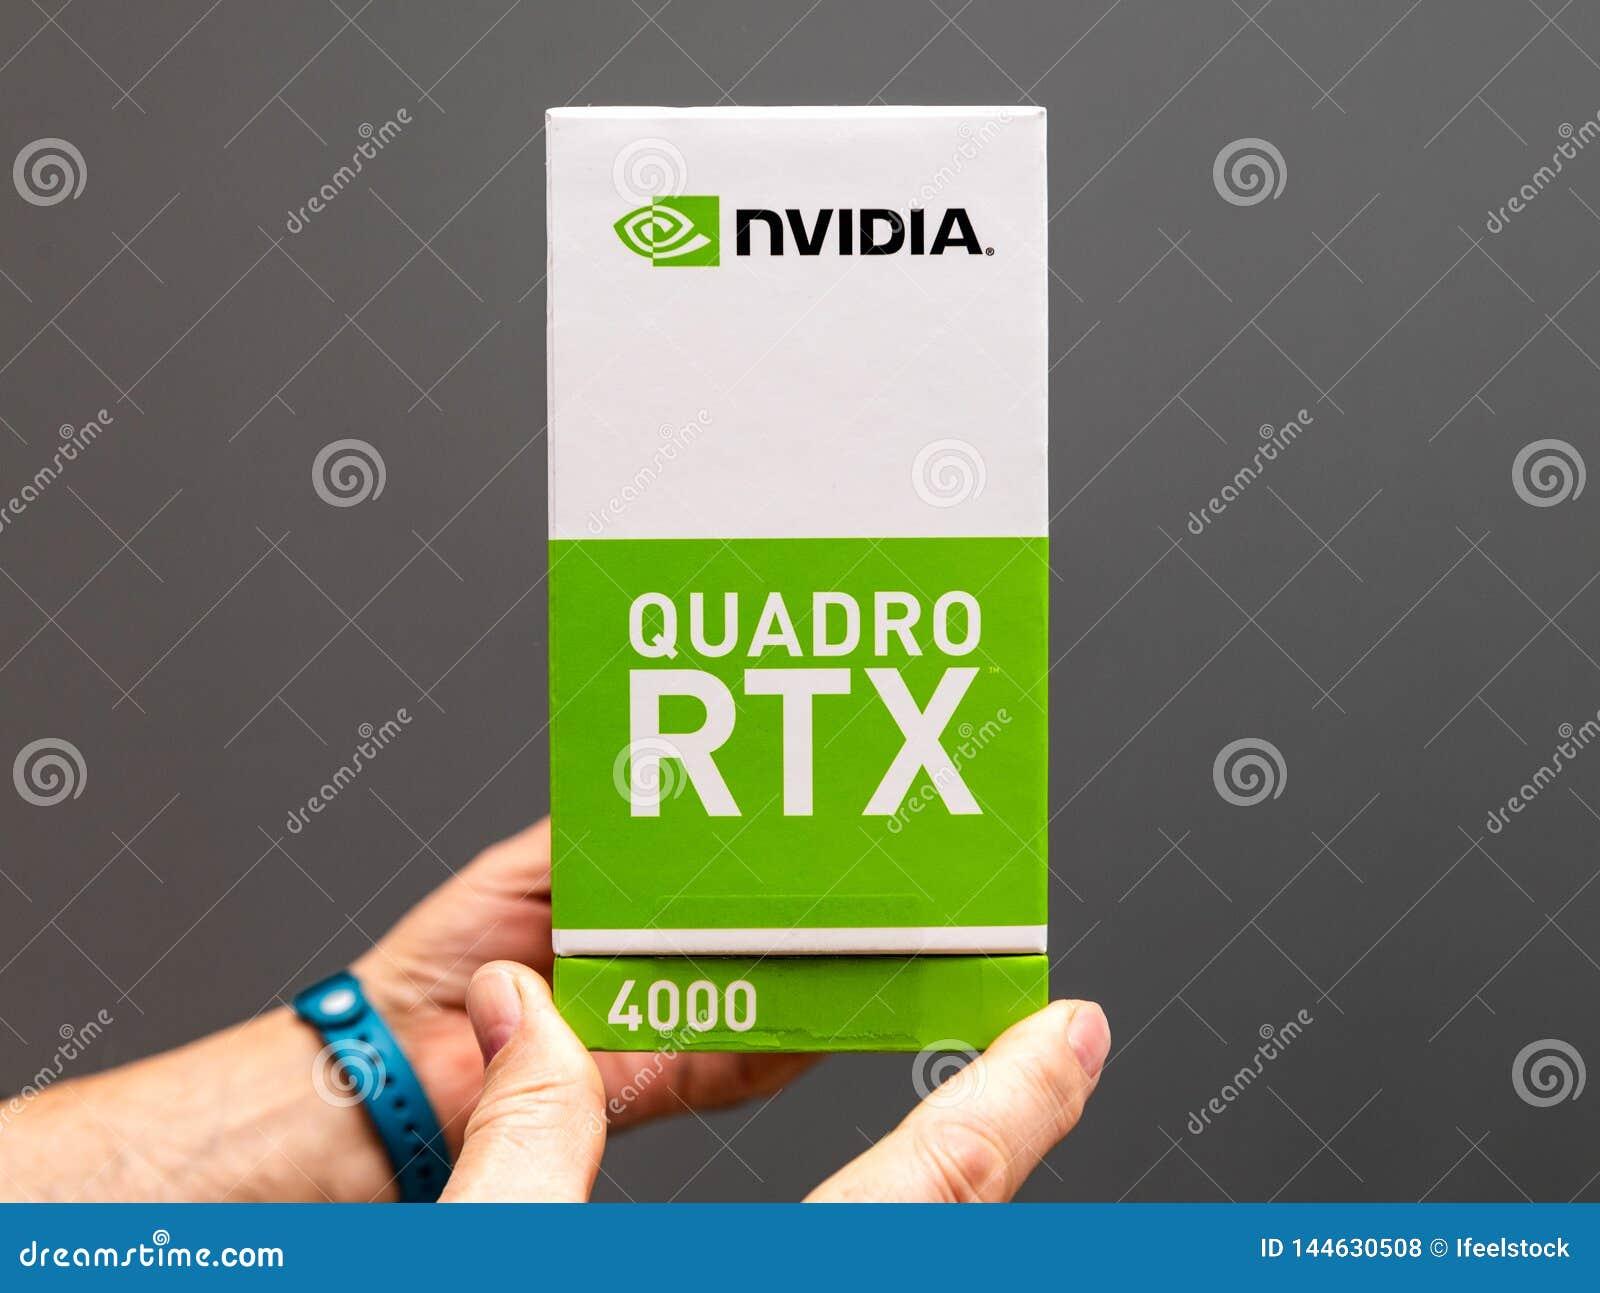 Senior Man Holding Cardboard Box Of New Nvidia Quadro RTX